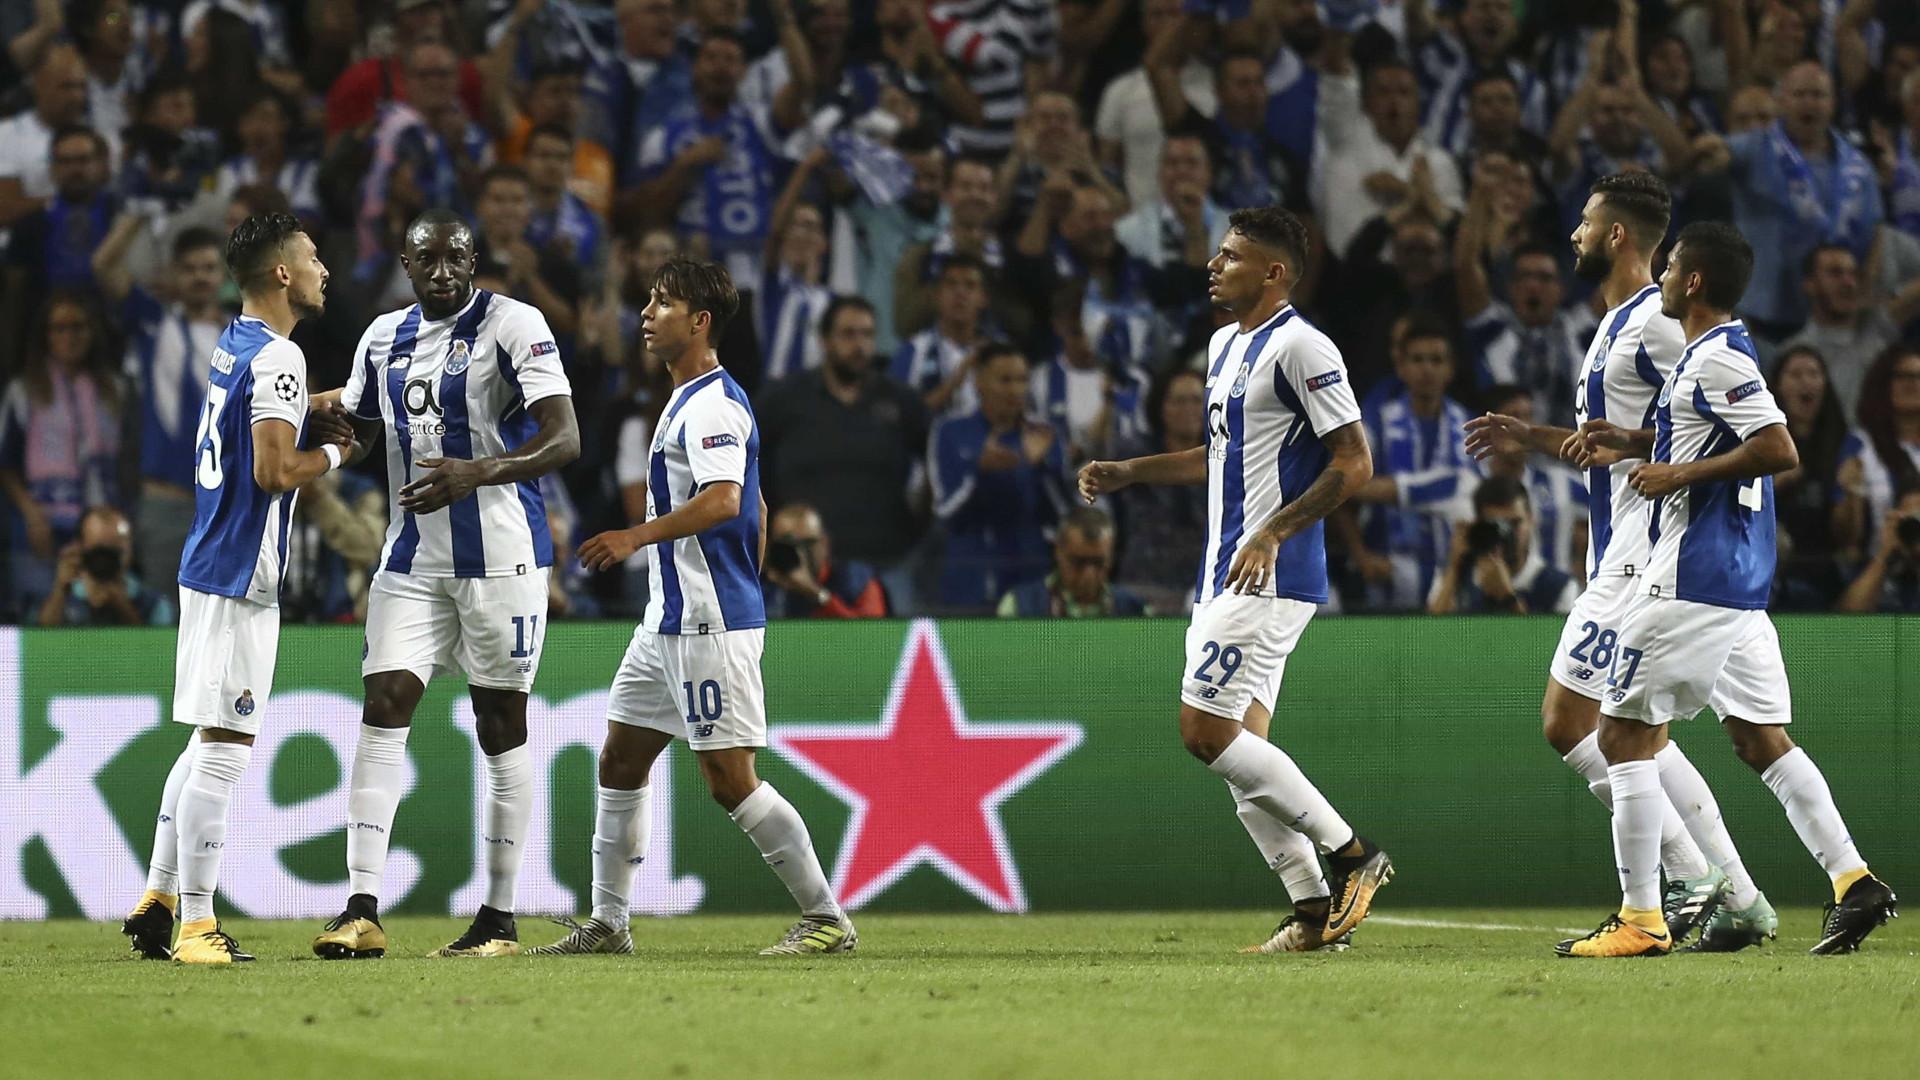 FC Porto goleia Portimonense e segue no topo da Liga